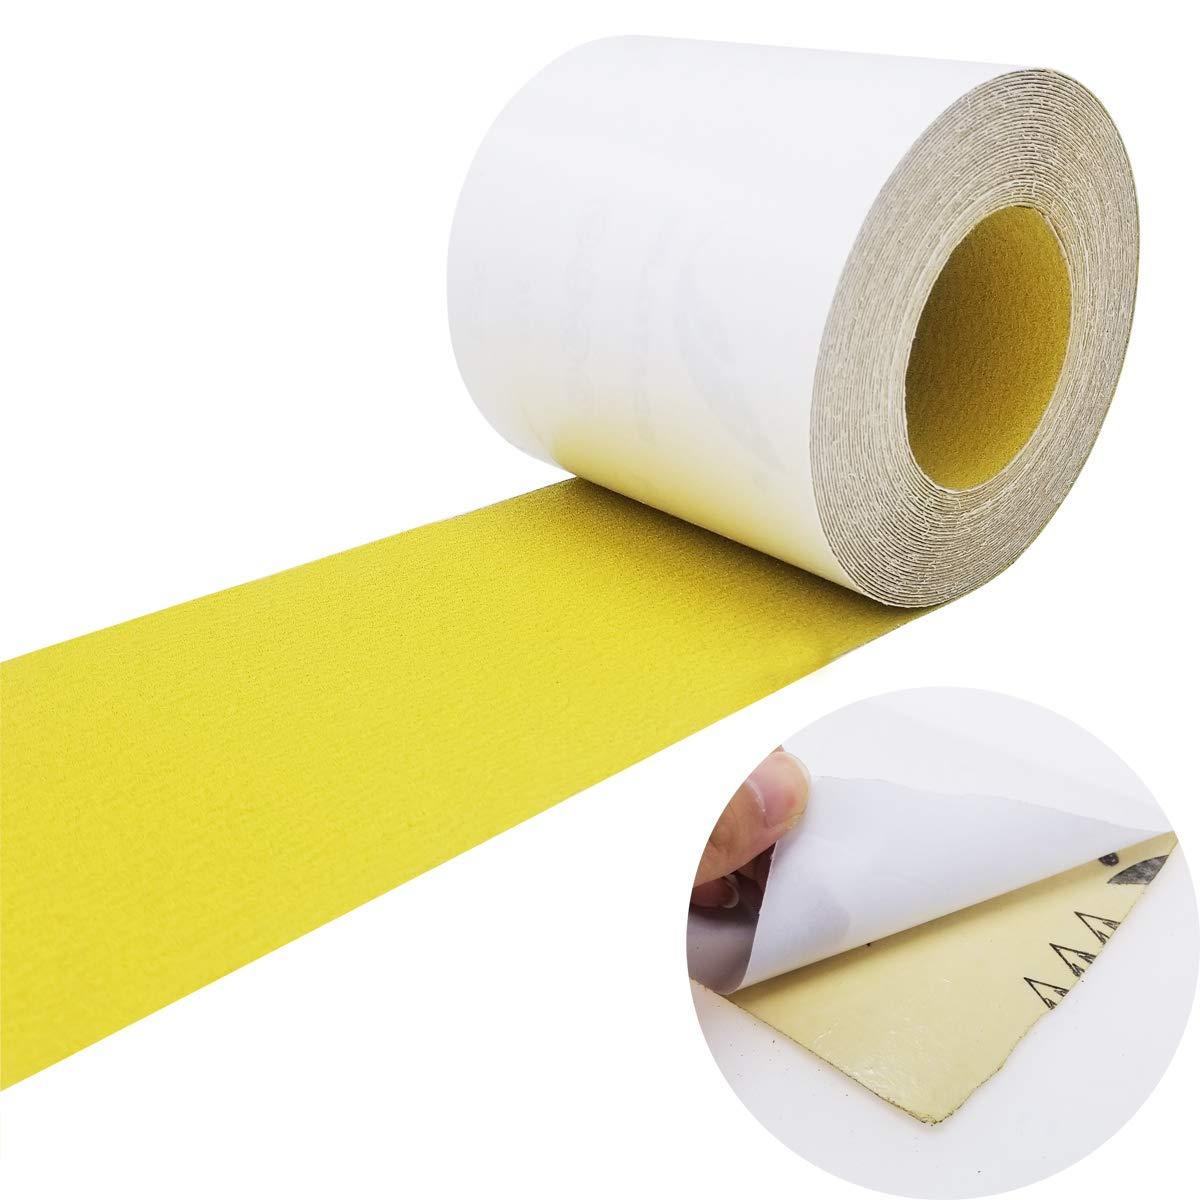 Sackorange PSA Self Adhesive Sticky Back 120-Grit Sandpaper Roll 4.5'' Inch x 10 Yards Aluminum Oxide Golden Yellow Longboard Sandpaper for Automotive and Woodworking(4.5inx10Y) by SACKORANGE